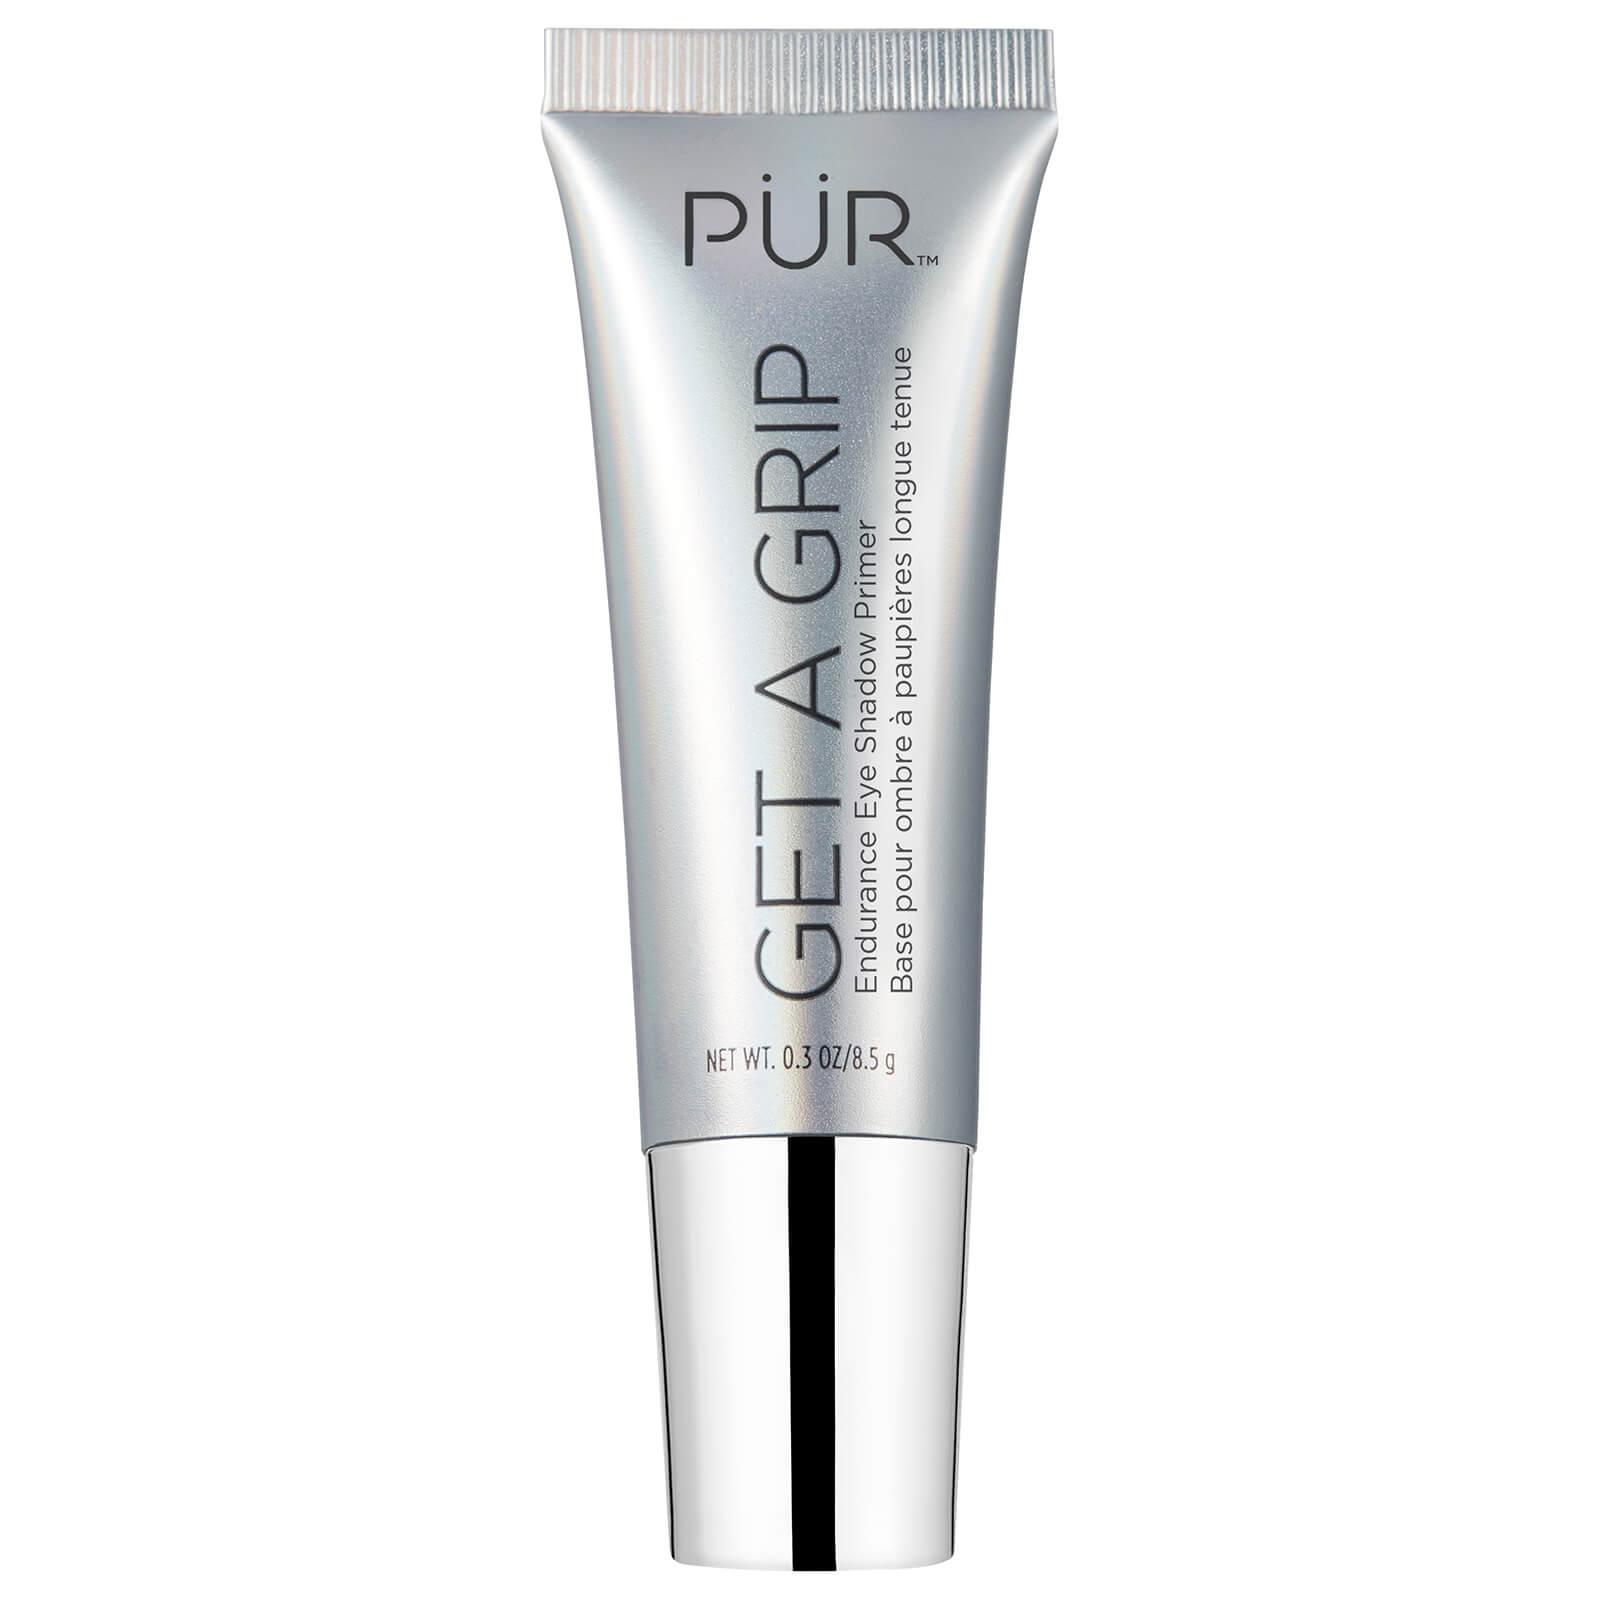 PÜR Get a Grip Endurance Eyeshadow Primer 8.5g